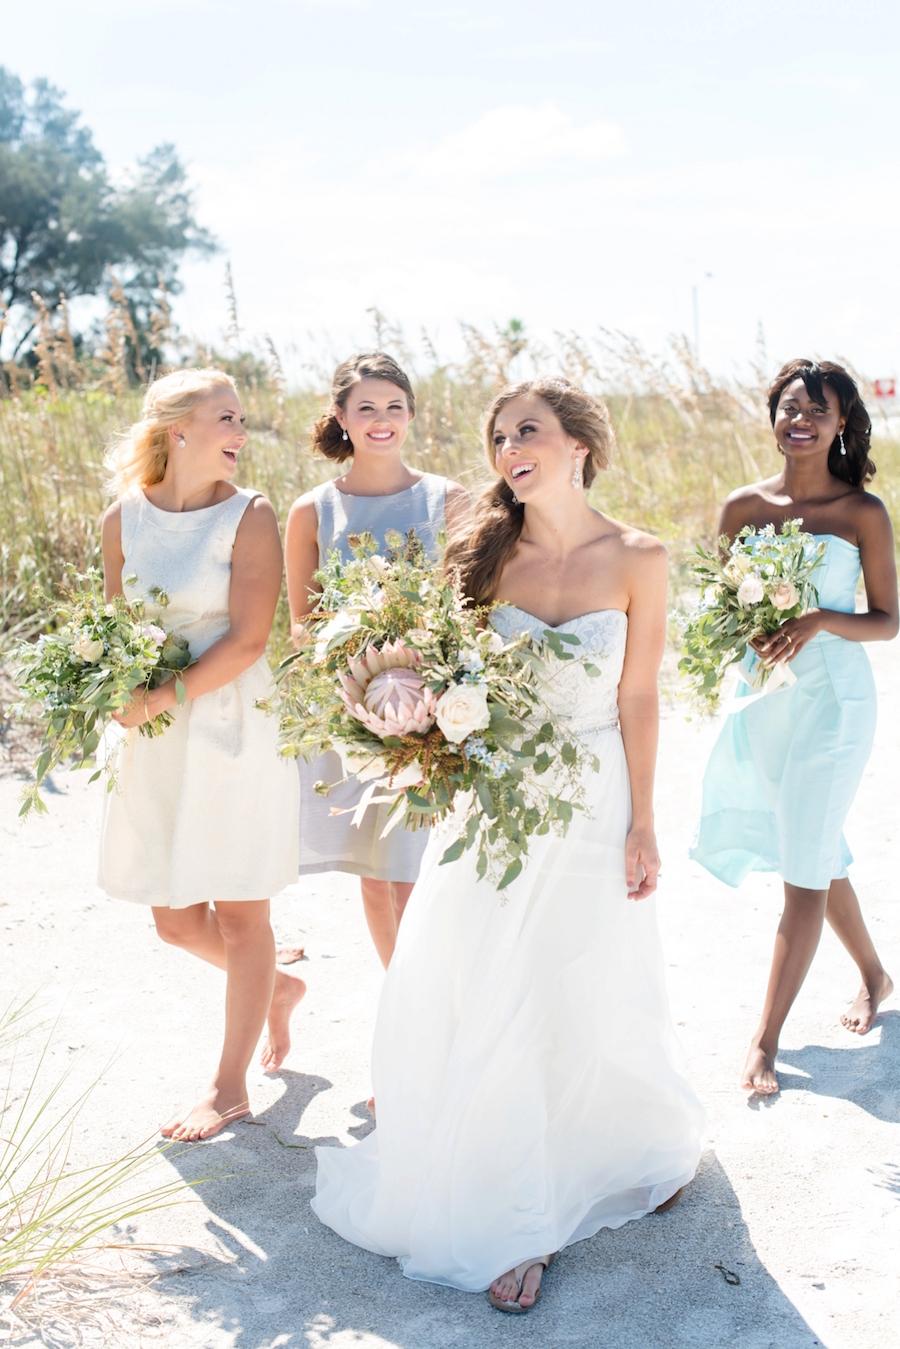 St. Pete Beach Coastal Wedding Portrait, Bride with Bridesmaid in Dessy Bridal Gowns at Beach Wedding| Tampa Bay Wedding Photographer: Caroline & Evan Photography | Tampa Bay Wedding Hair & Makeup By Lasting Luxe Hair & Makeup